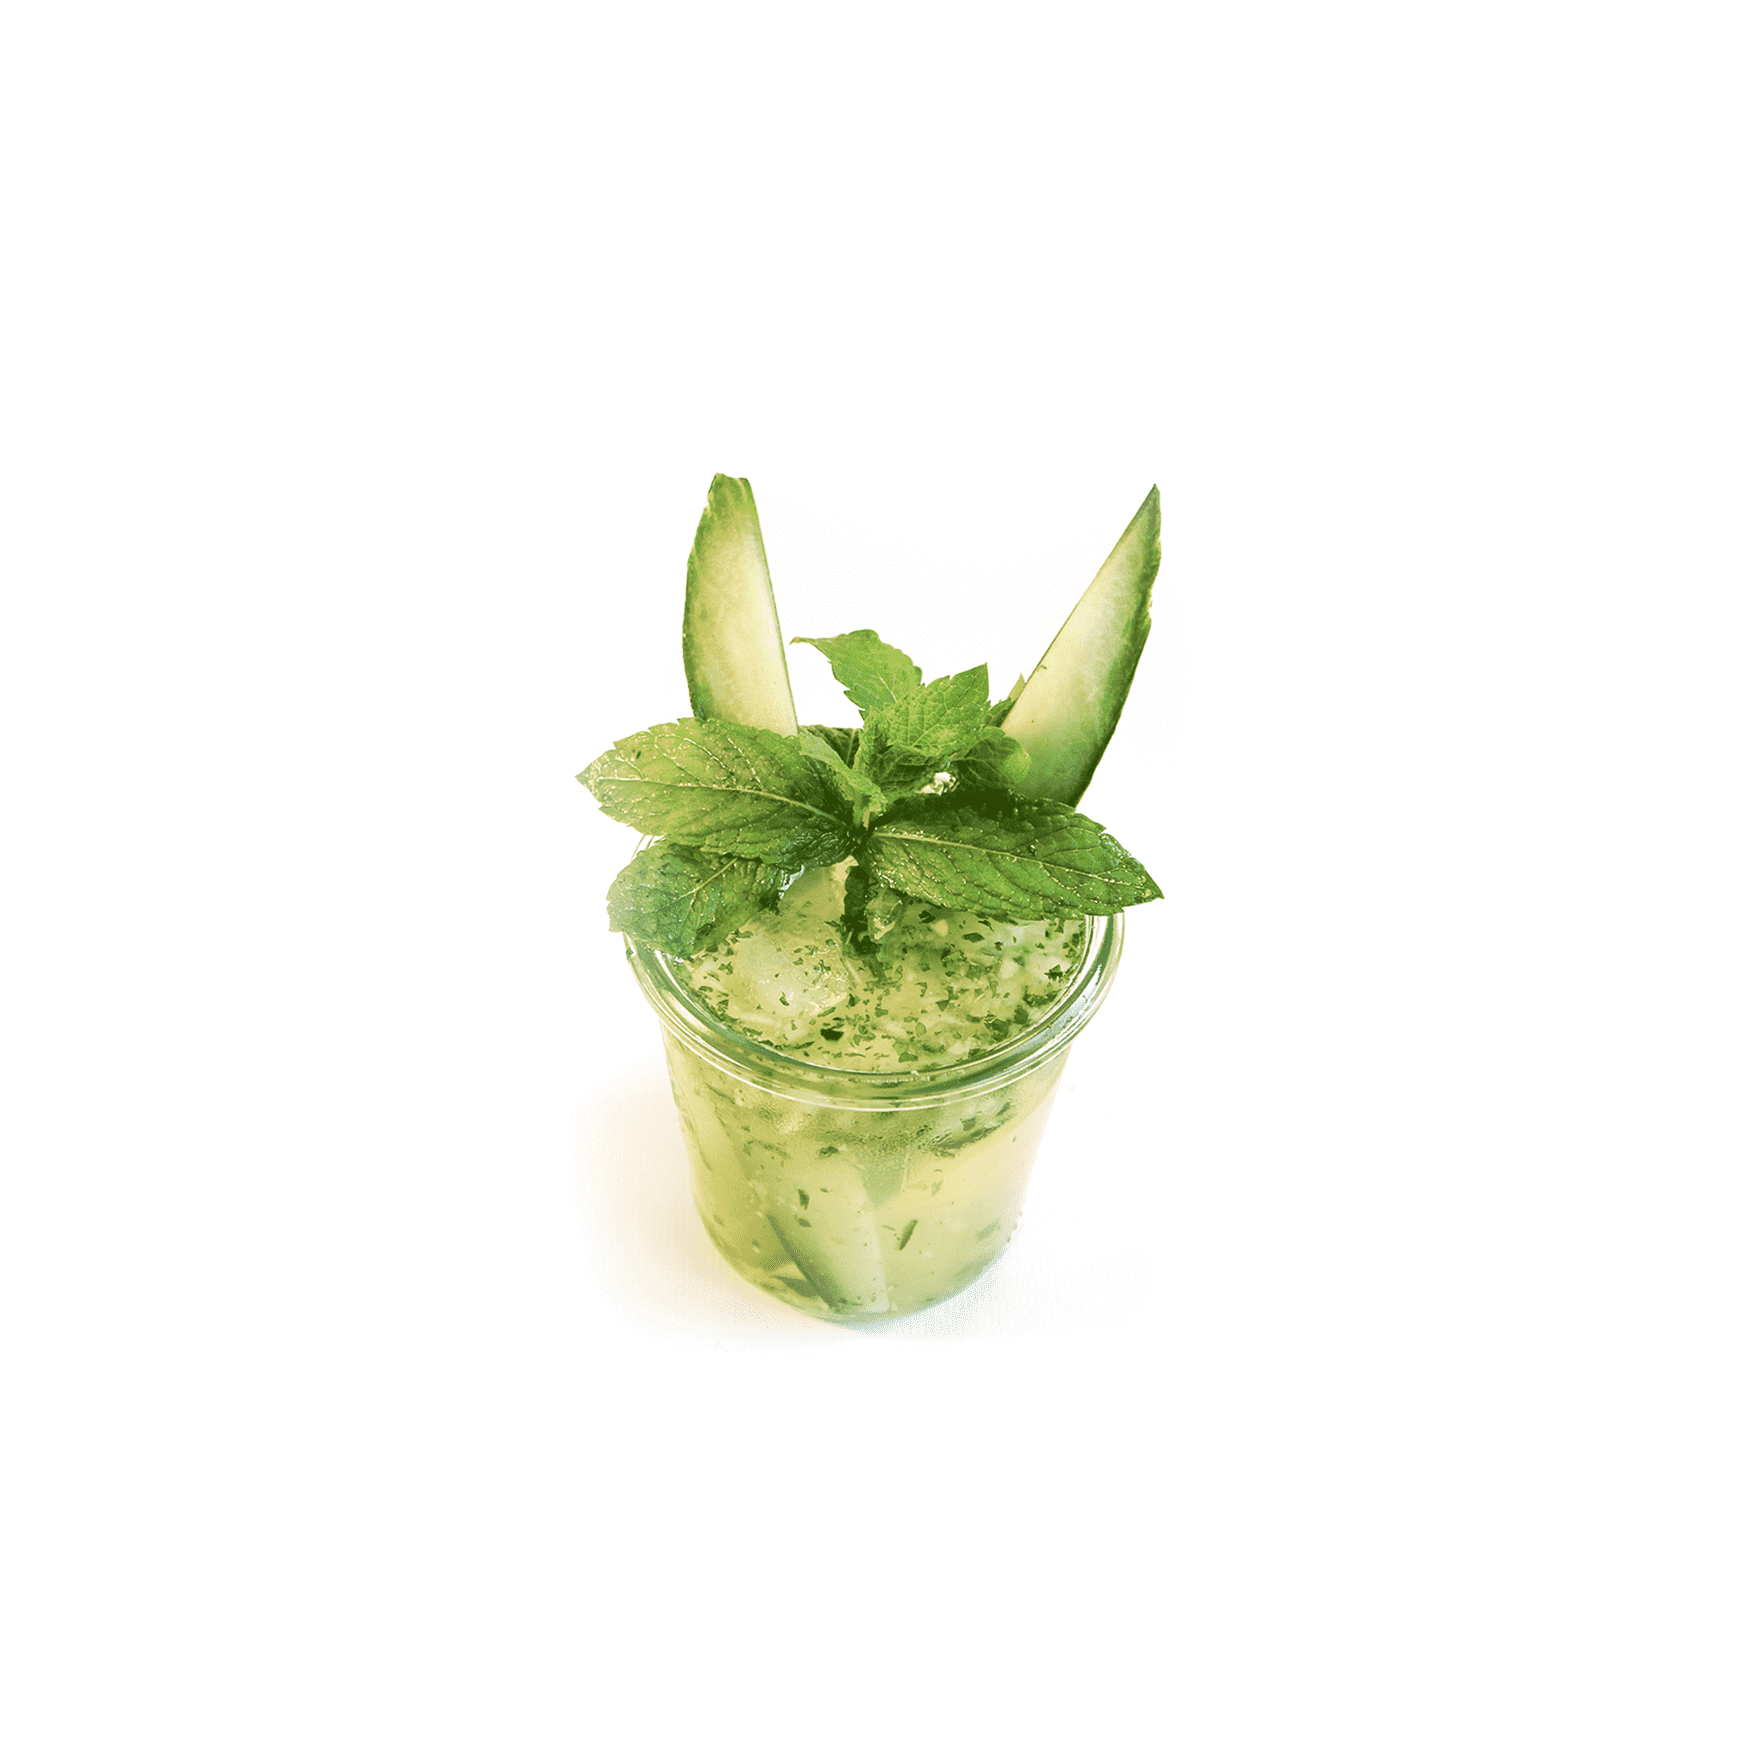 Mundart Sirup - Rezeptbild für Scharfe Limo